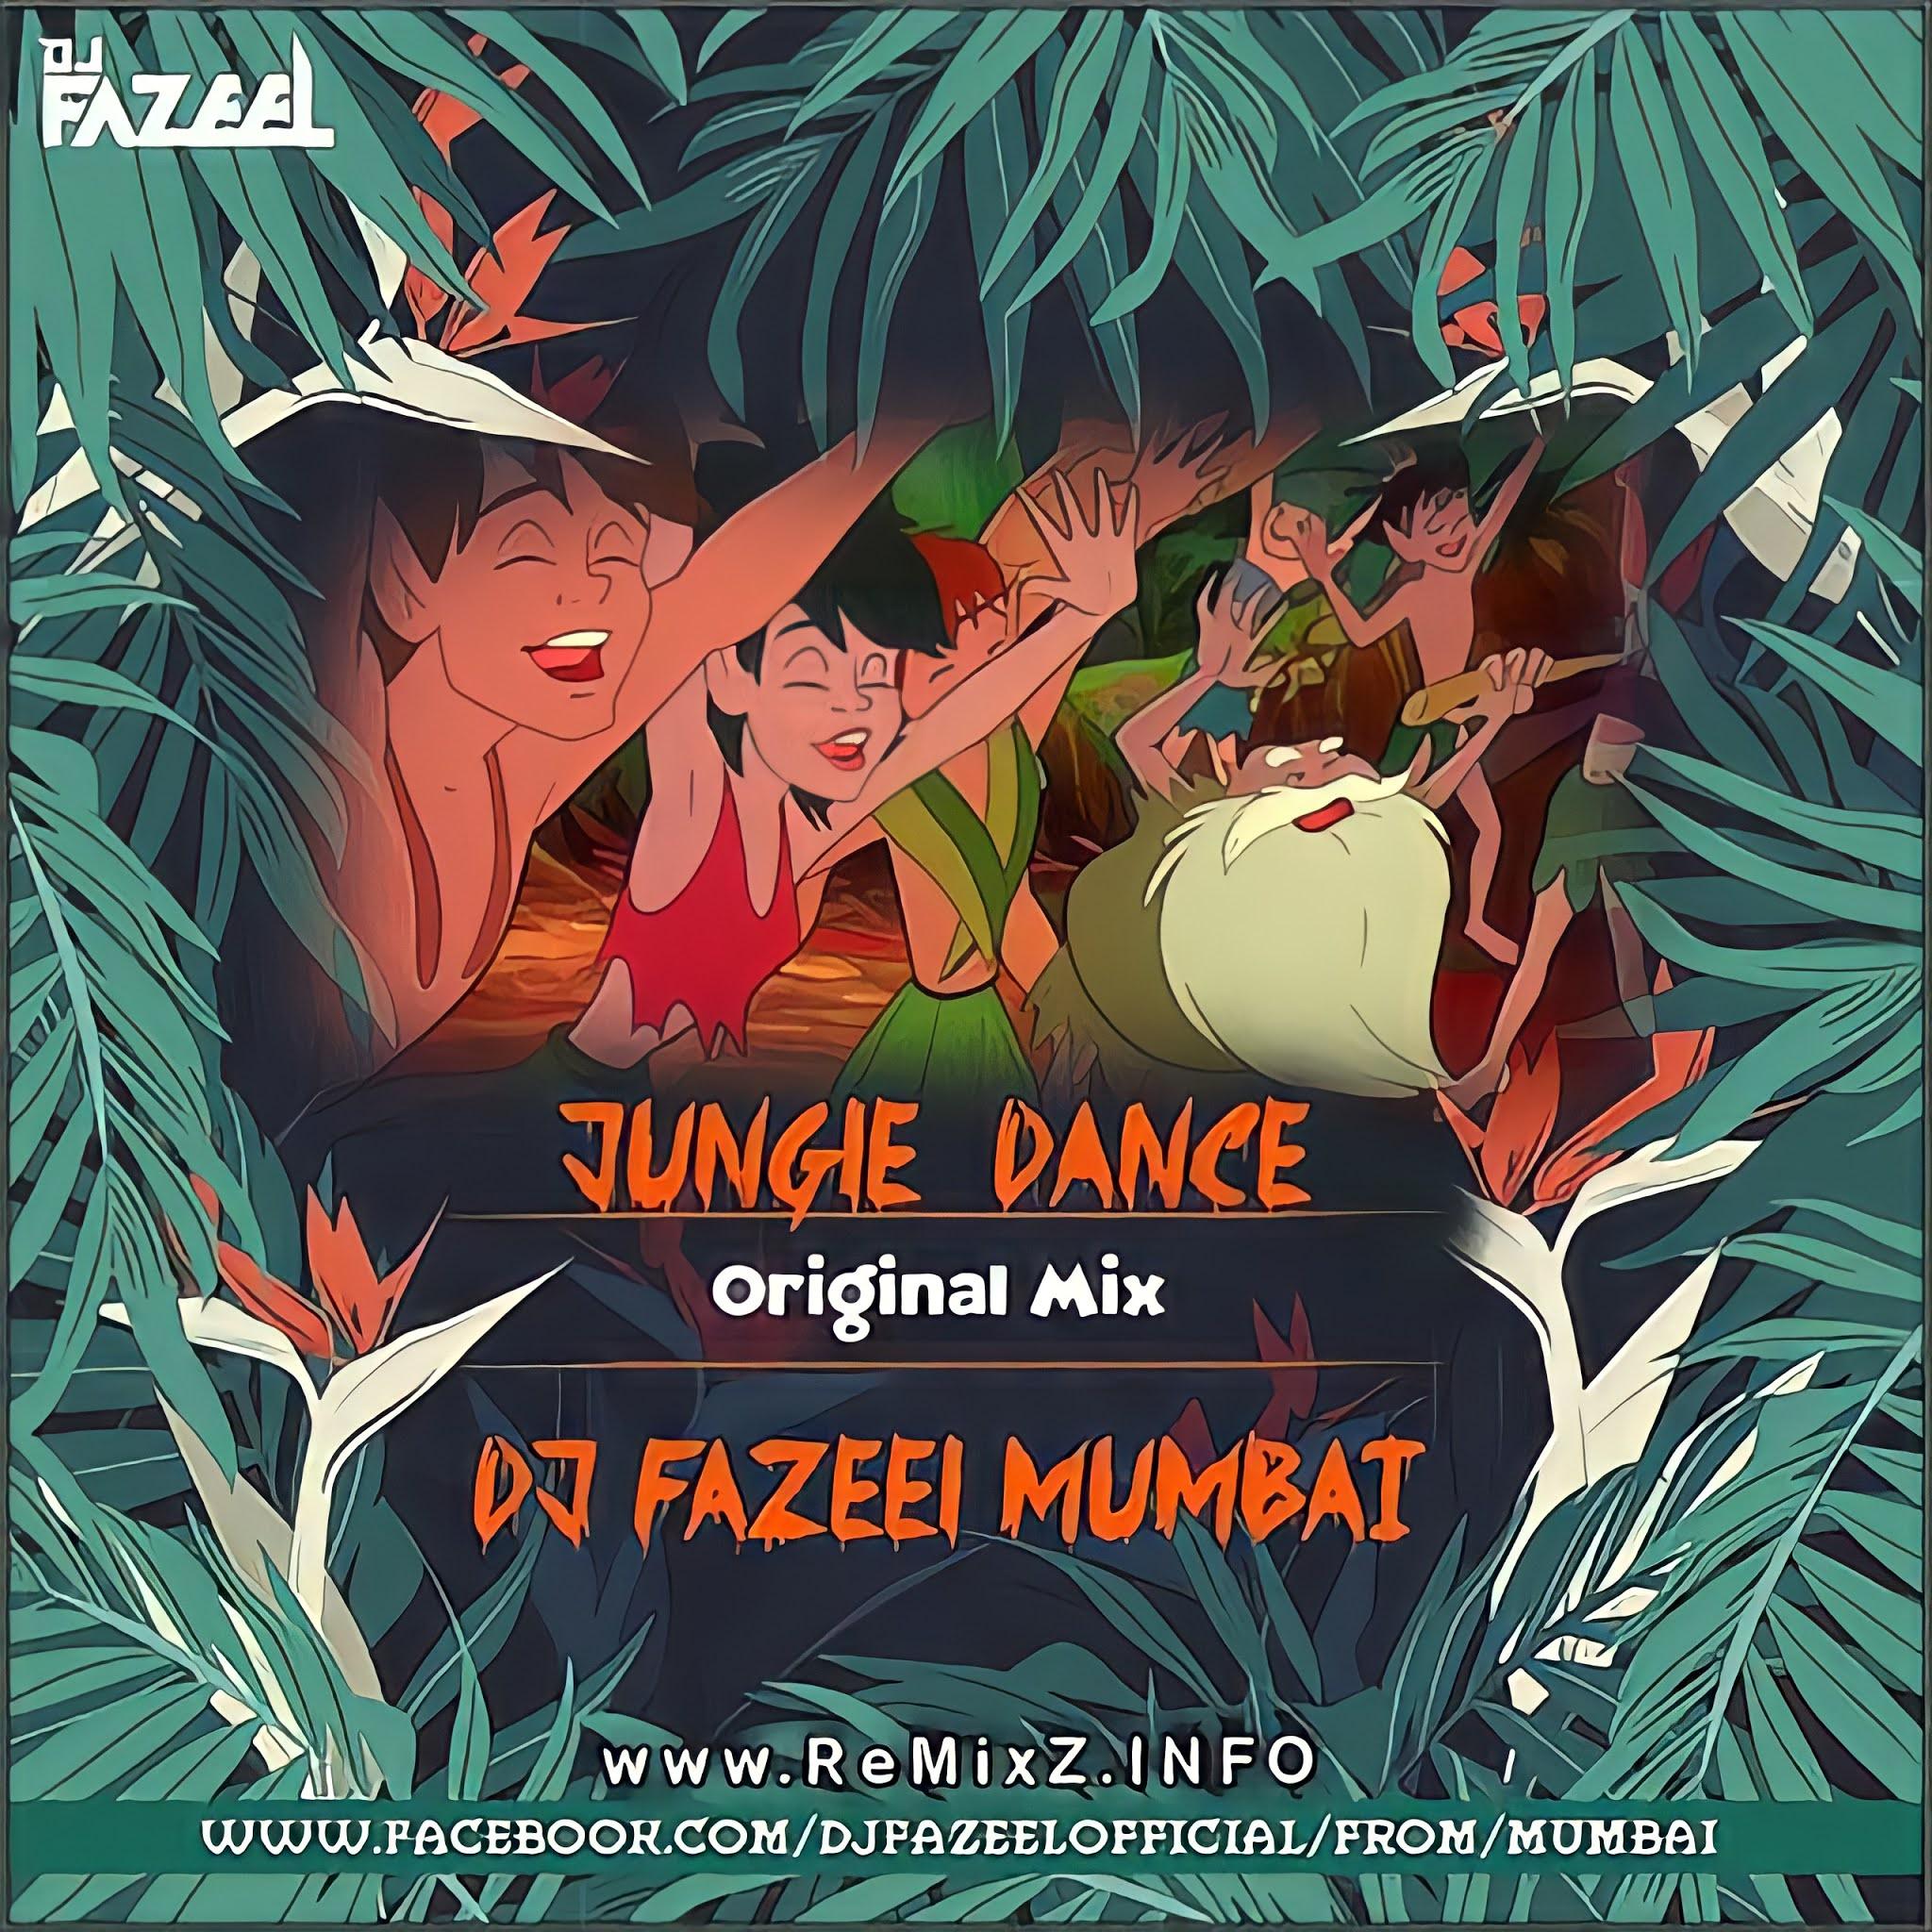 jungle-dance-original-mix-dj-fazeel.jpg